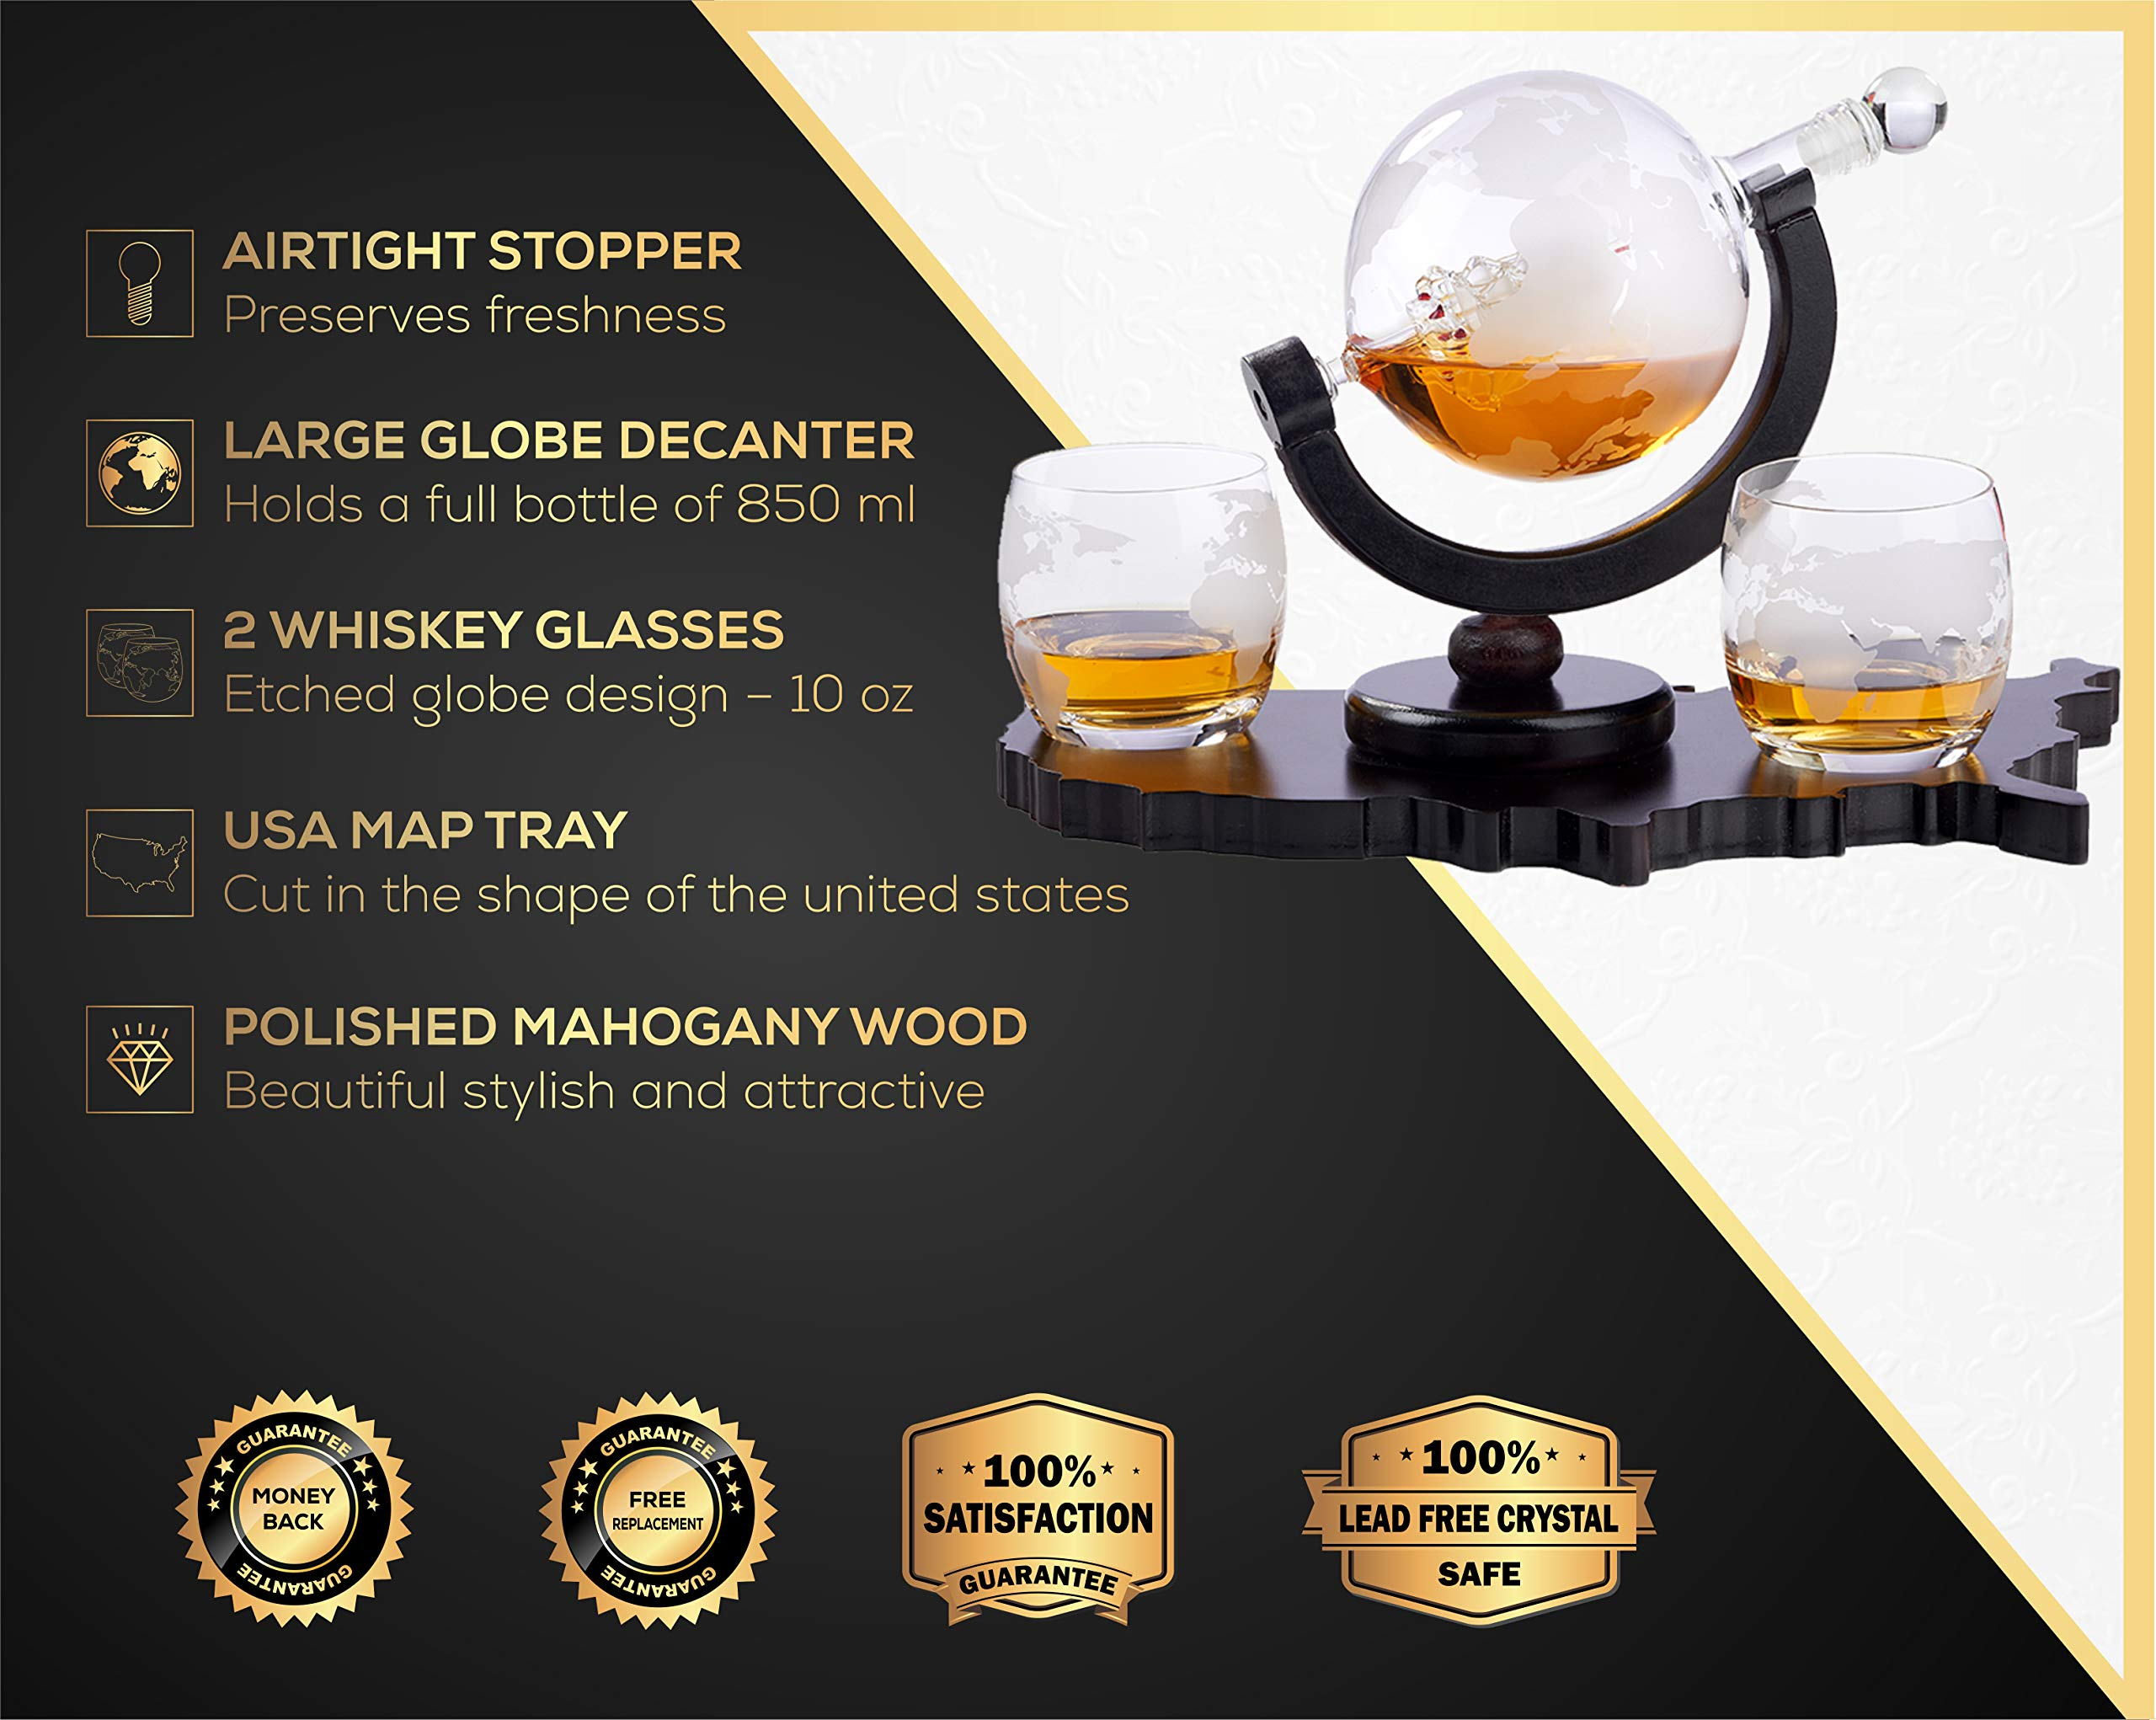 Whiskey Decanter Set World Etched Globe Decanter Airtight Stopper Antique Ship Liquor Dispenser Perfect Bar Gift Bourbon Scotch Vodka Liquor USA Map Tray 850 ml by Bezrat (Image #2)